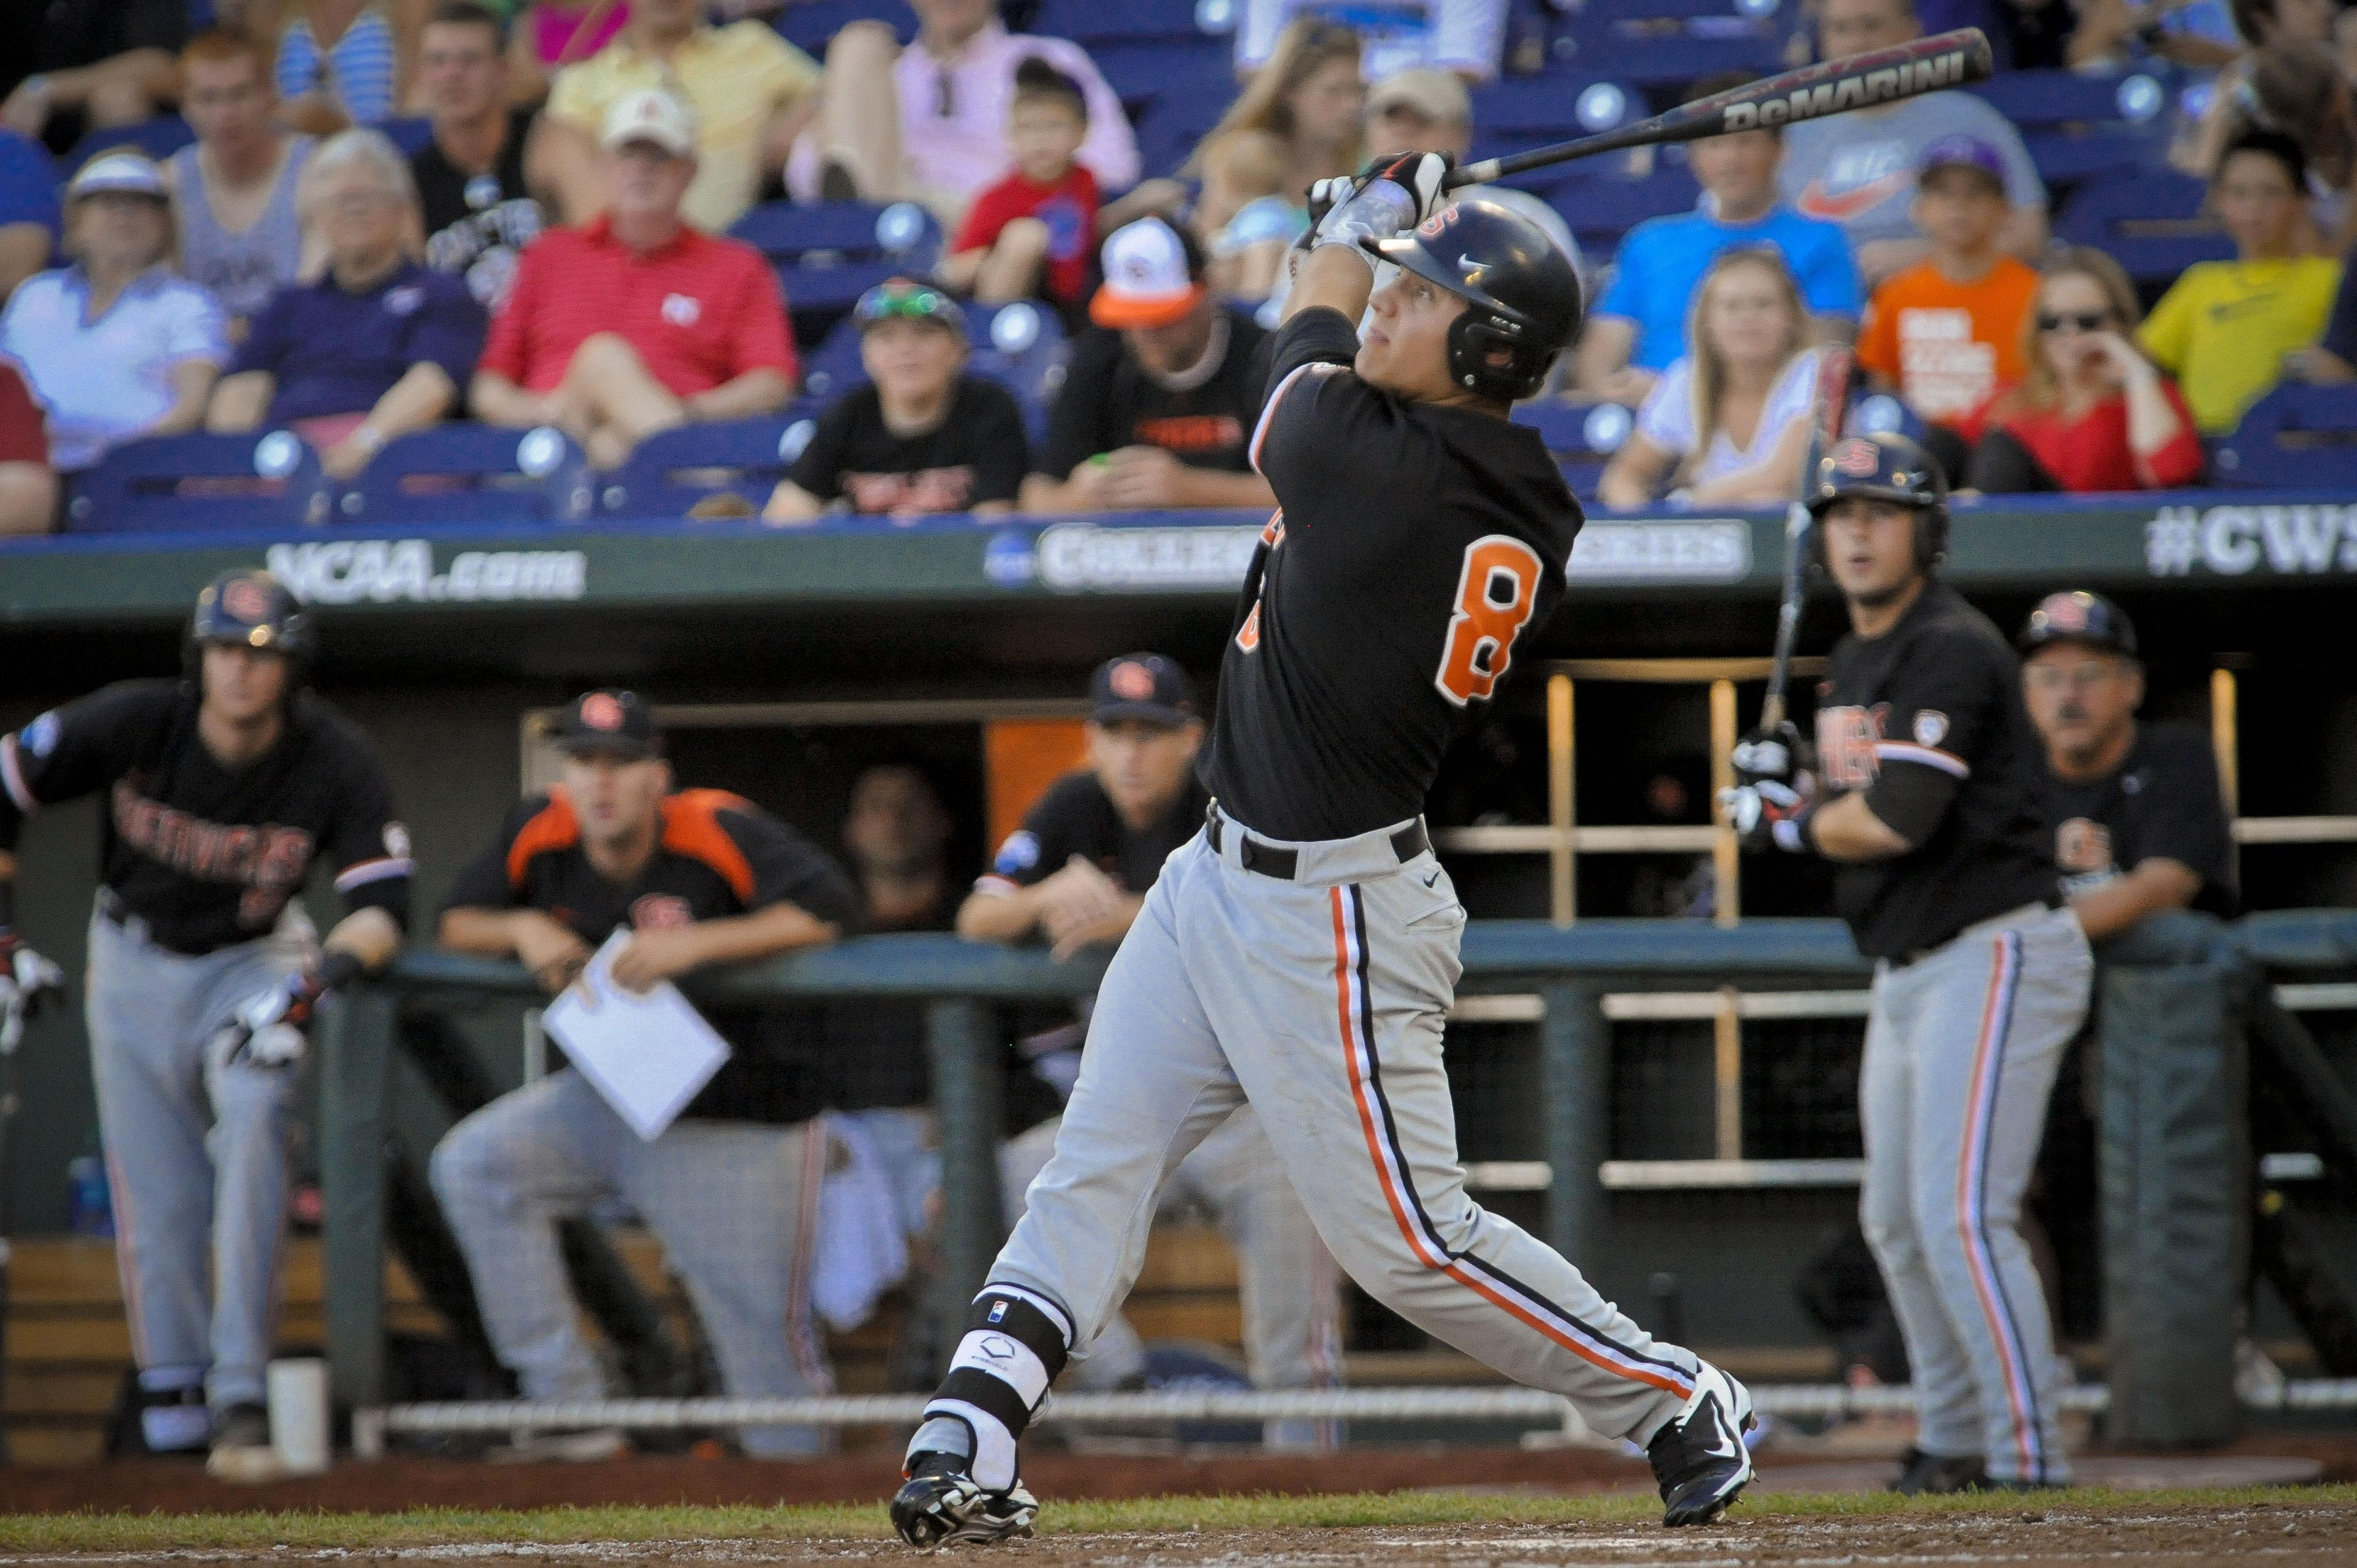 Oregon State Baseball